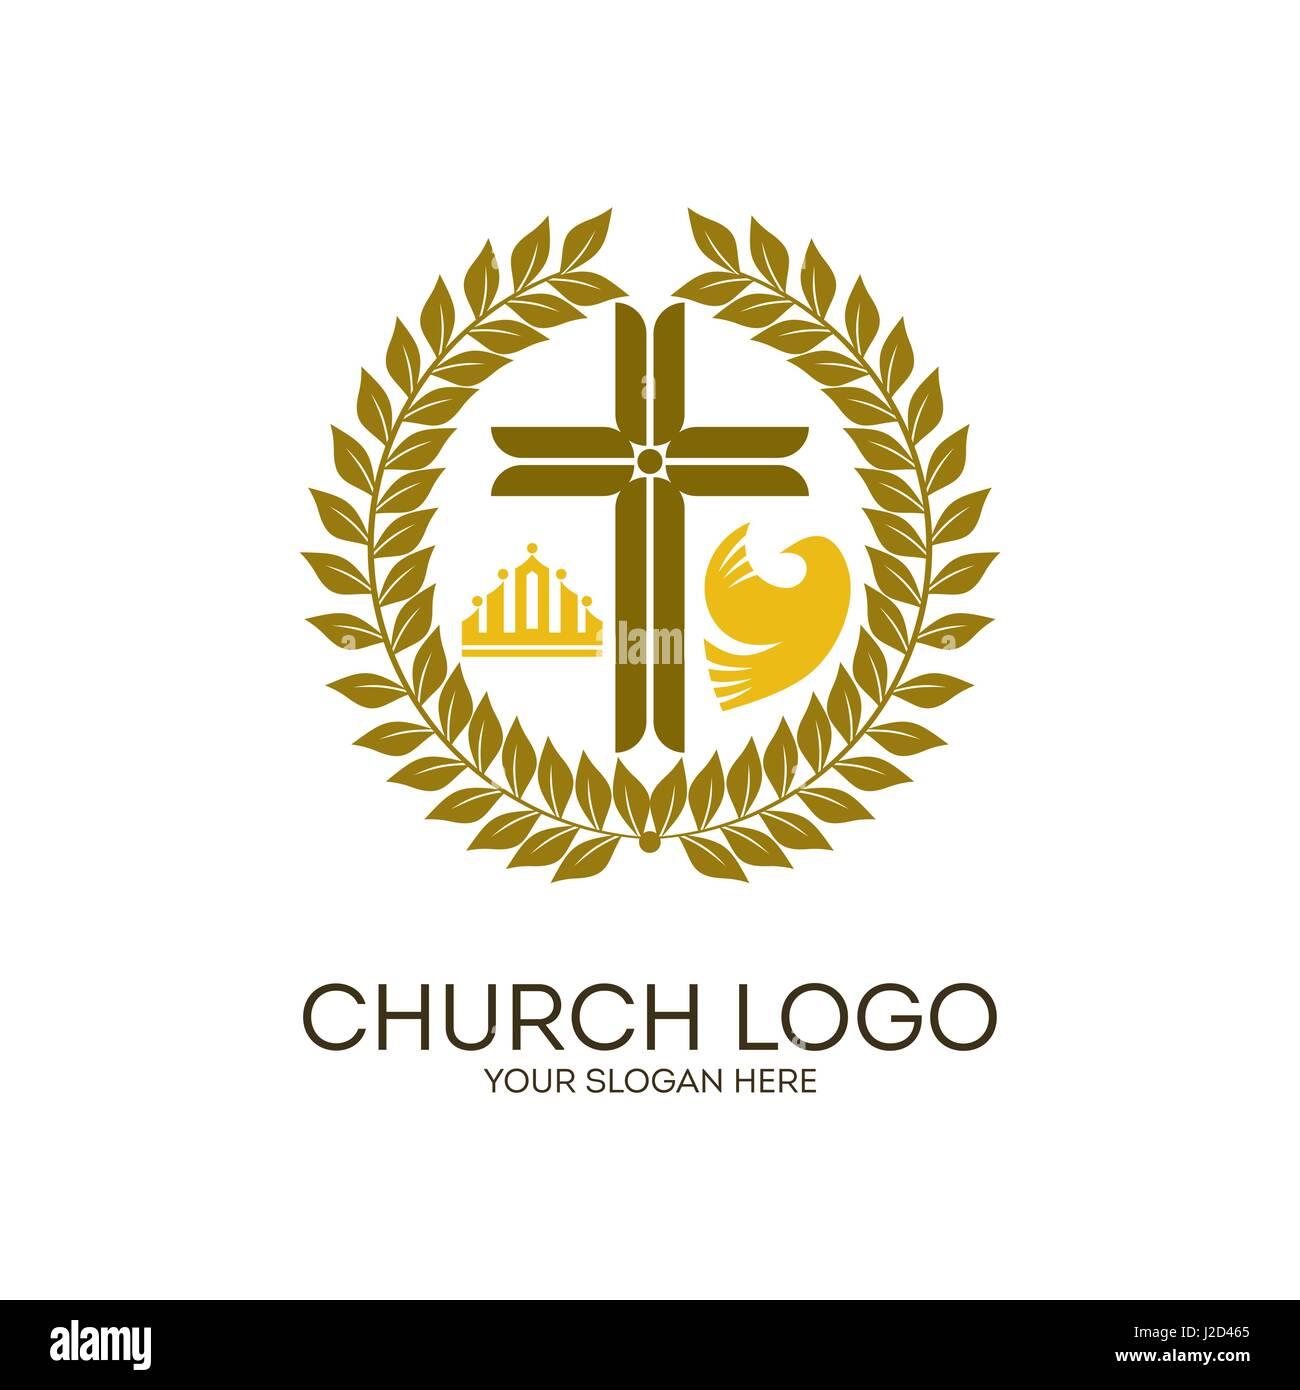 Church Logo Cross Jesus Crown Stock Photos Church Logo Cross Jesus